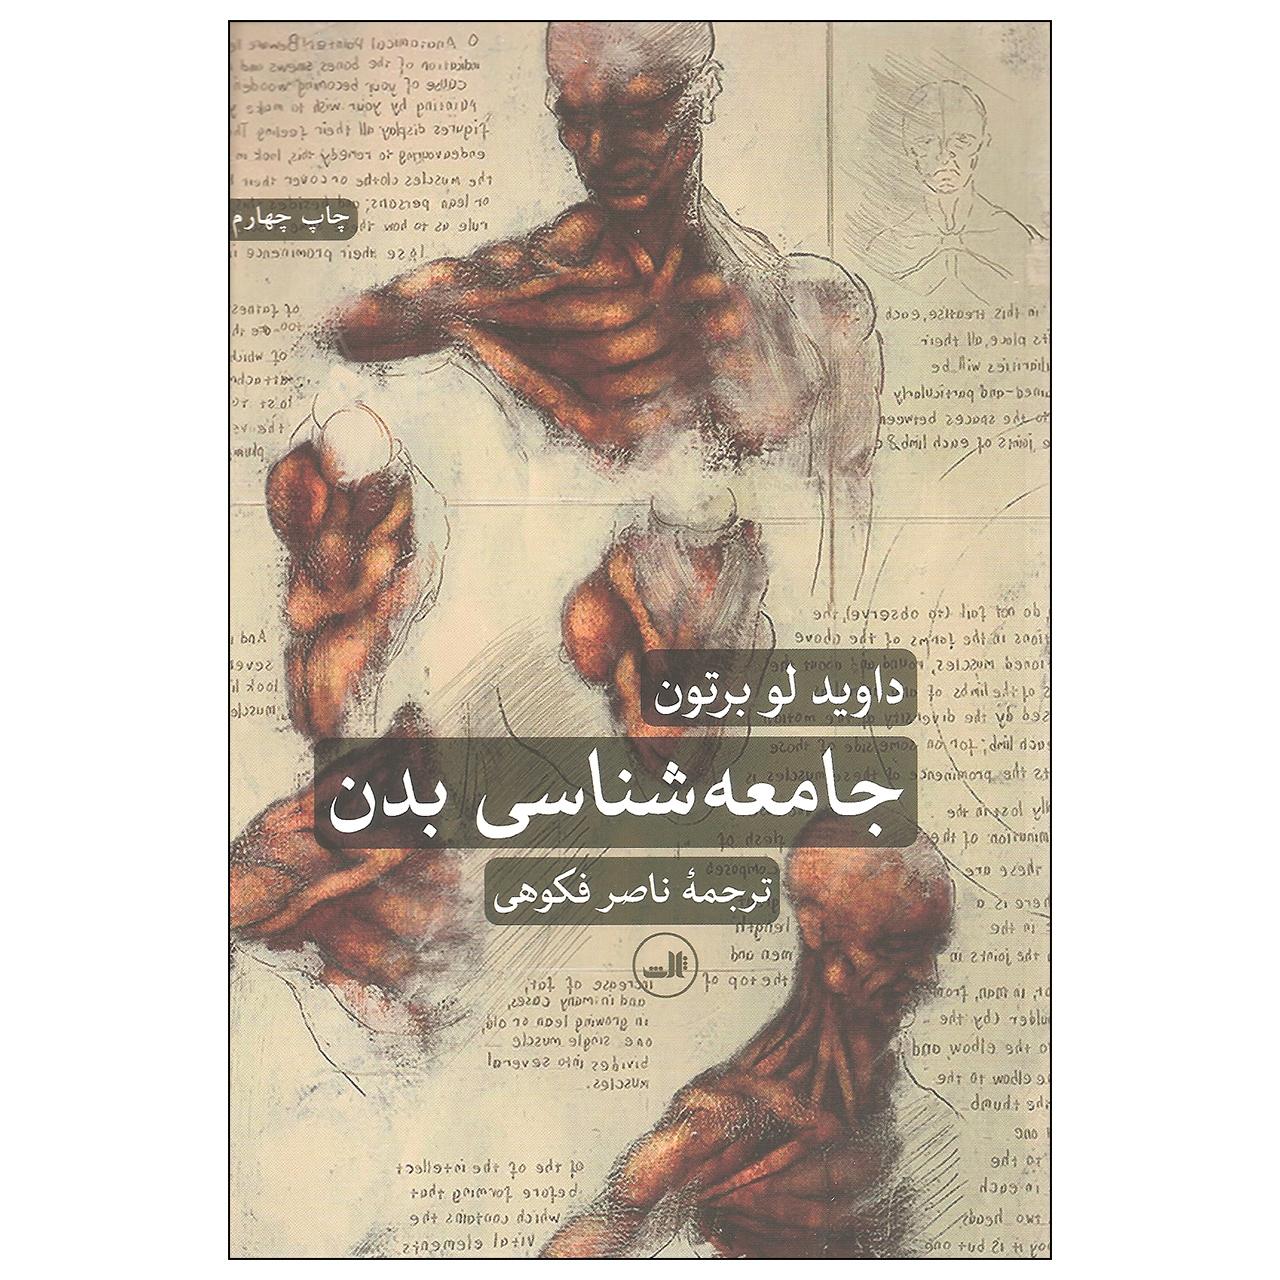 کتاب جامعه شناسی بدن اثر داوید لو برتون نشر ثالث